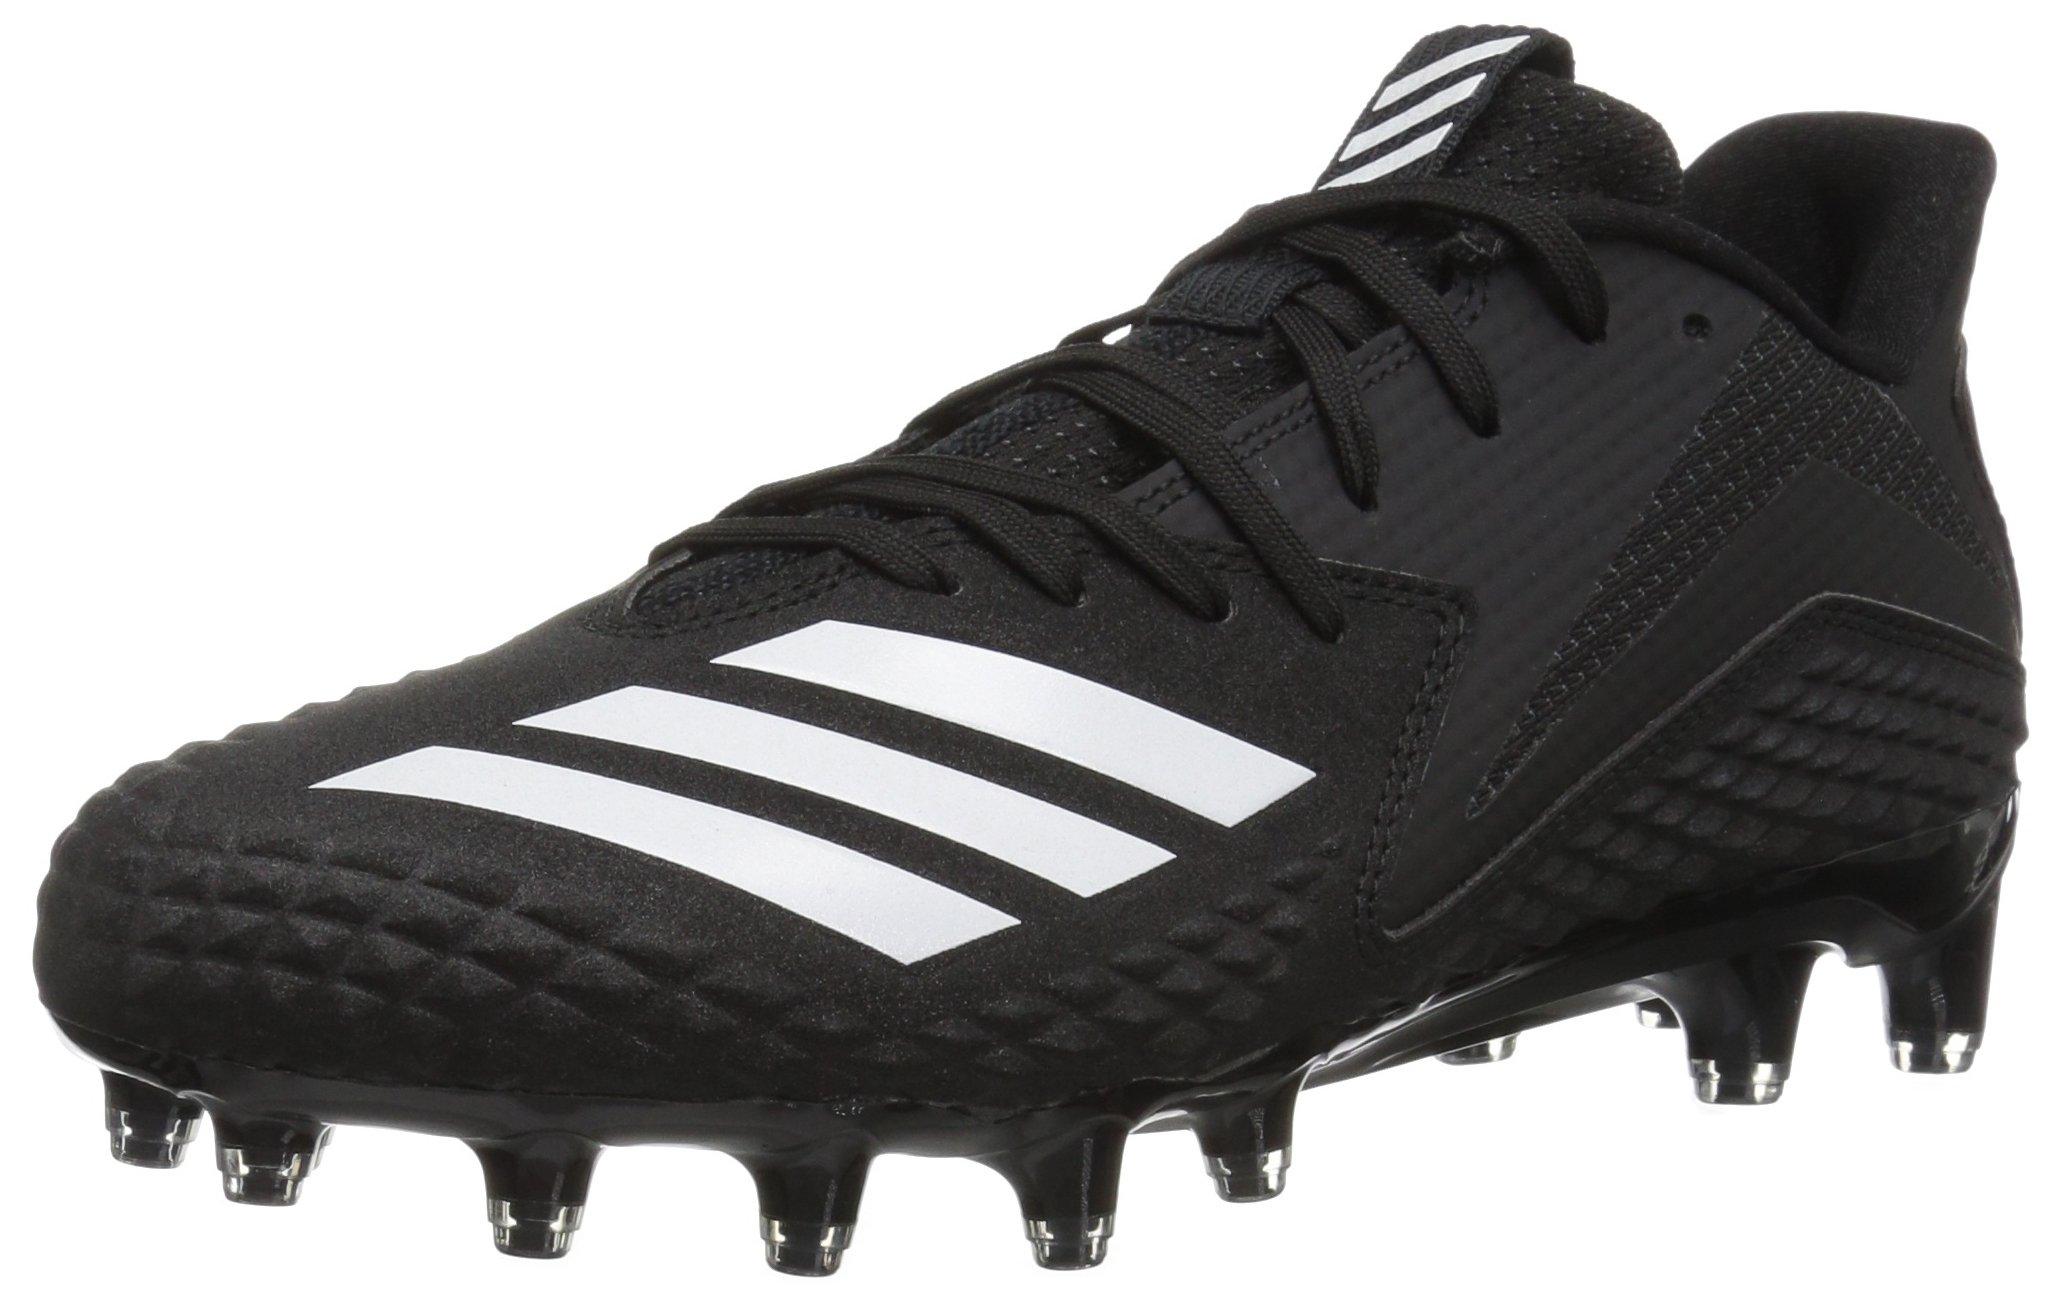 adidas Men's Freak x Carbon Football Shoe, Black/White/Black, 12 M US by adidas